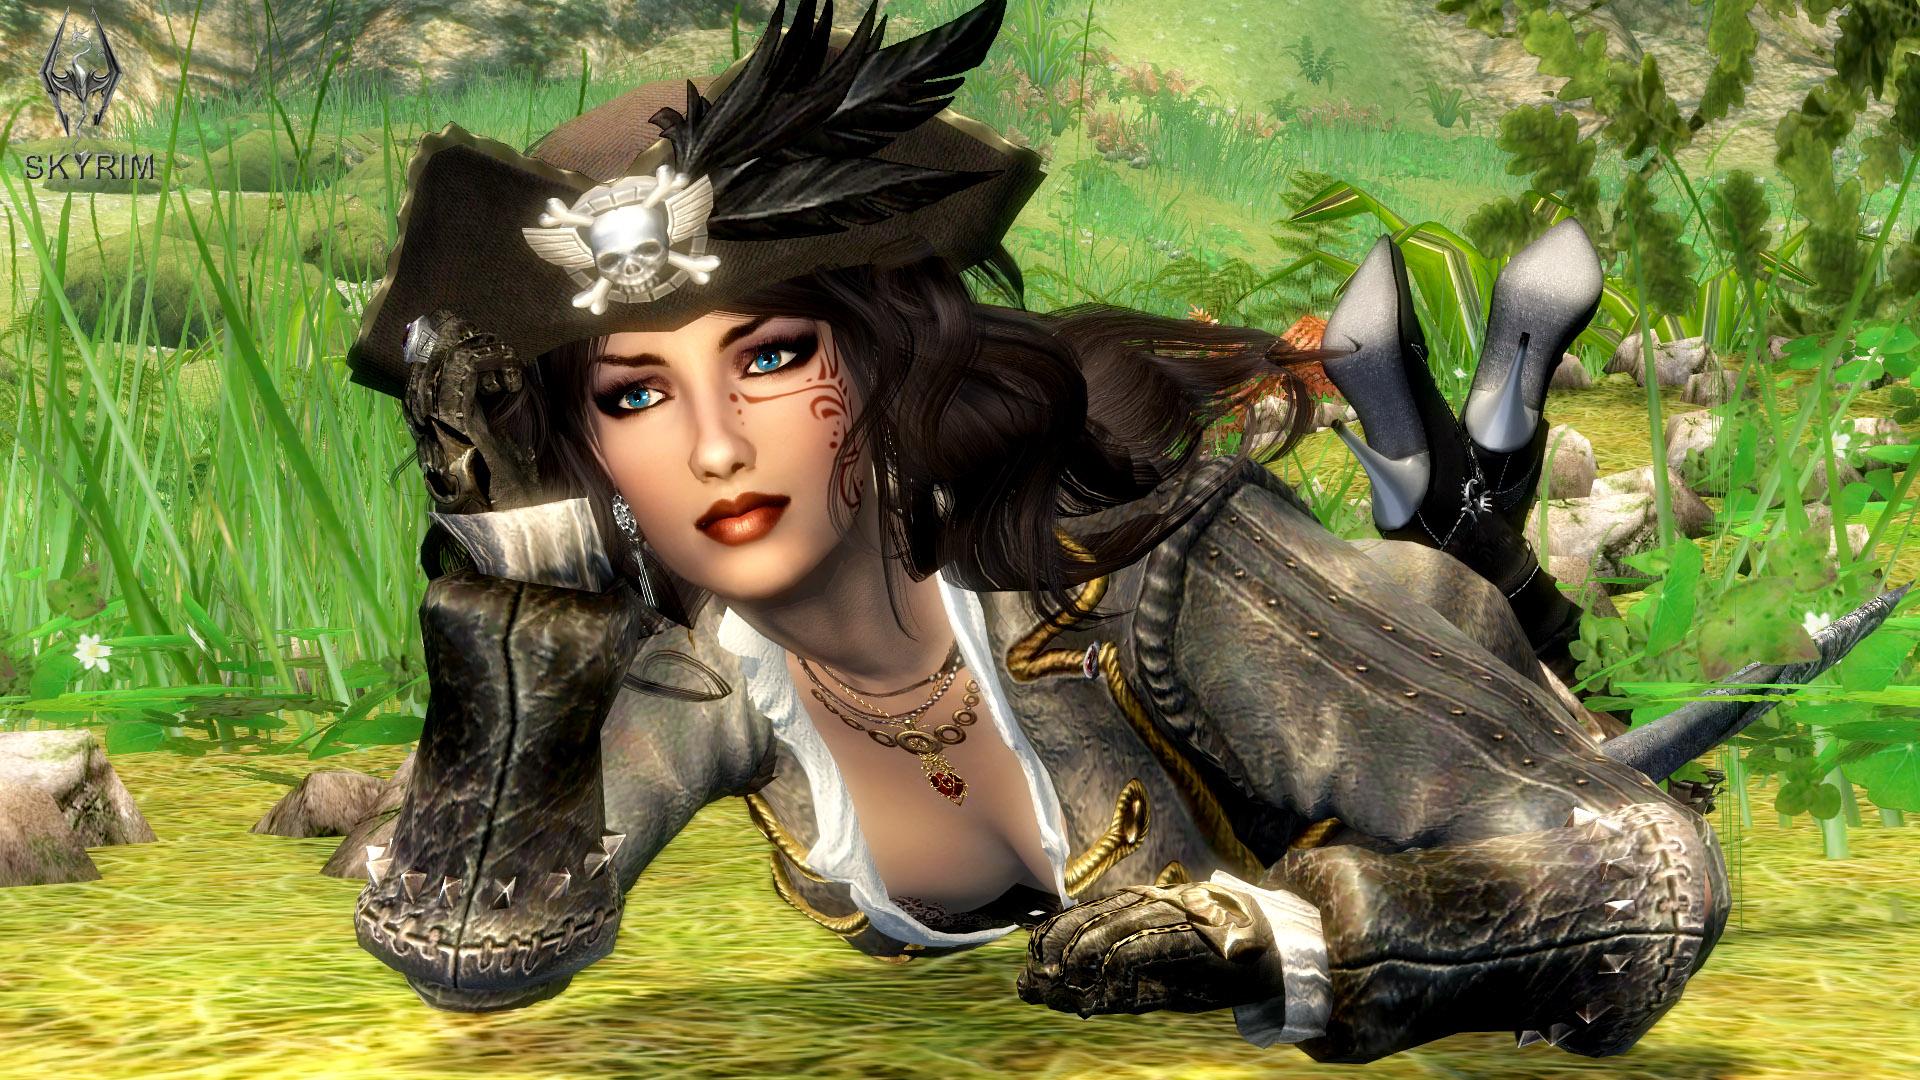 030. Как здесь хорошо.jpg - Elder Scrolls 5: Skyrim, the CBBE, Сборка-21